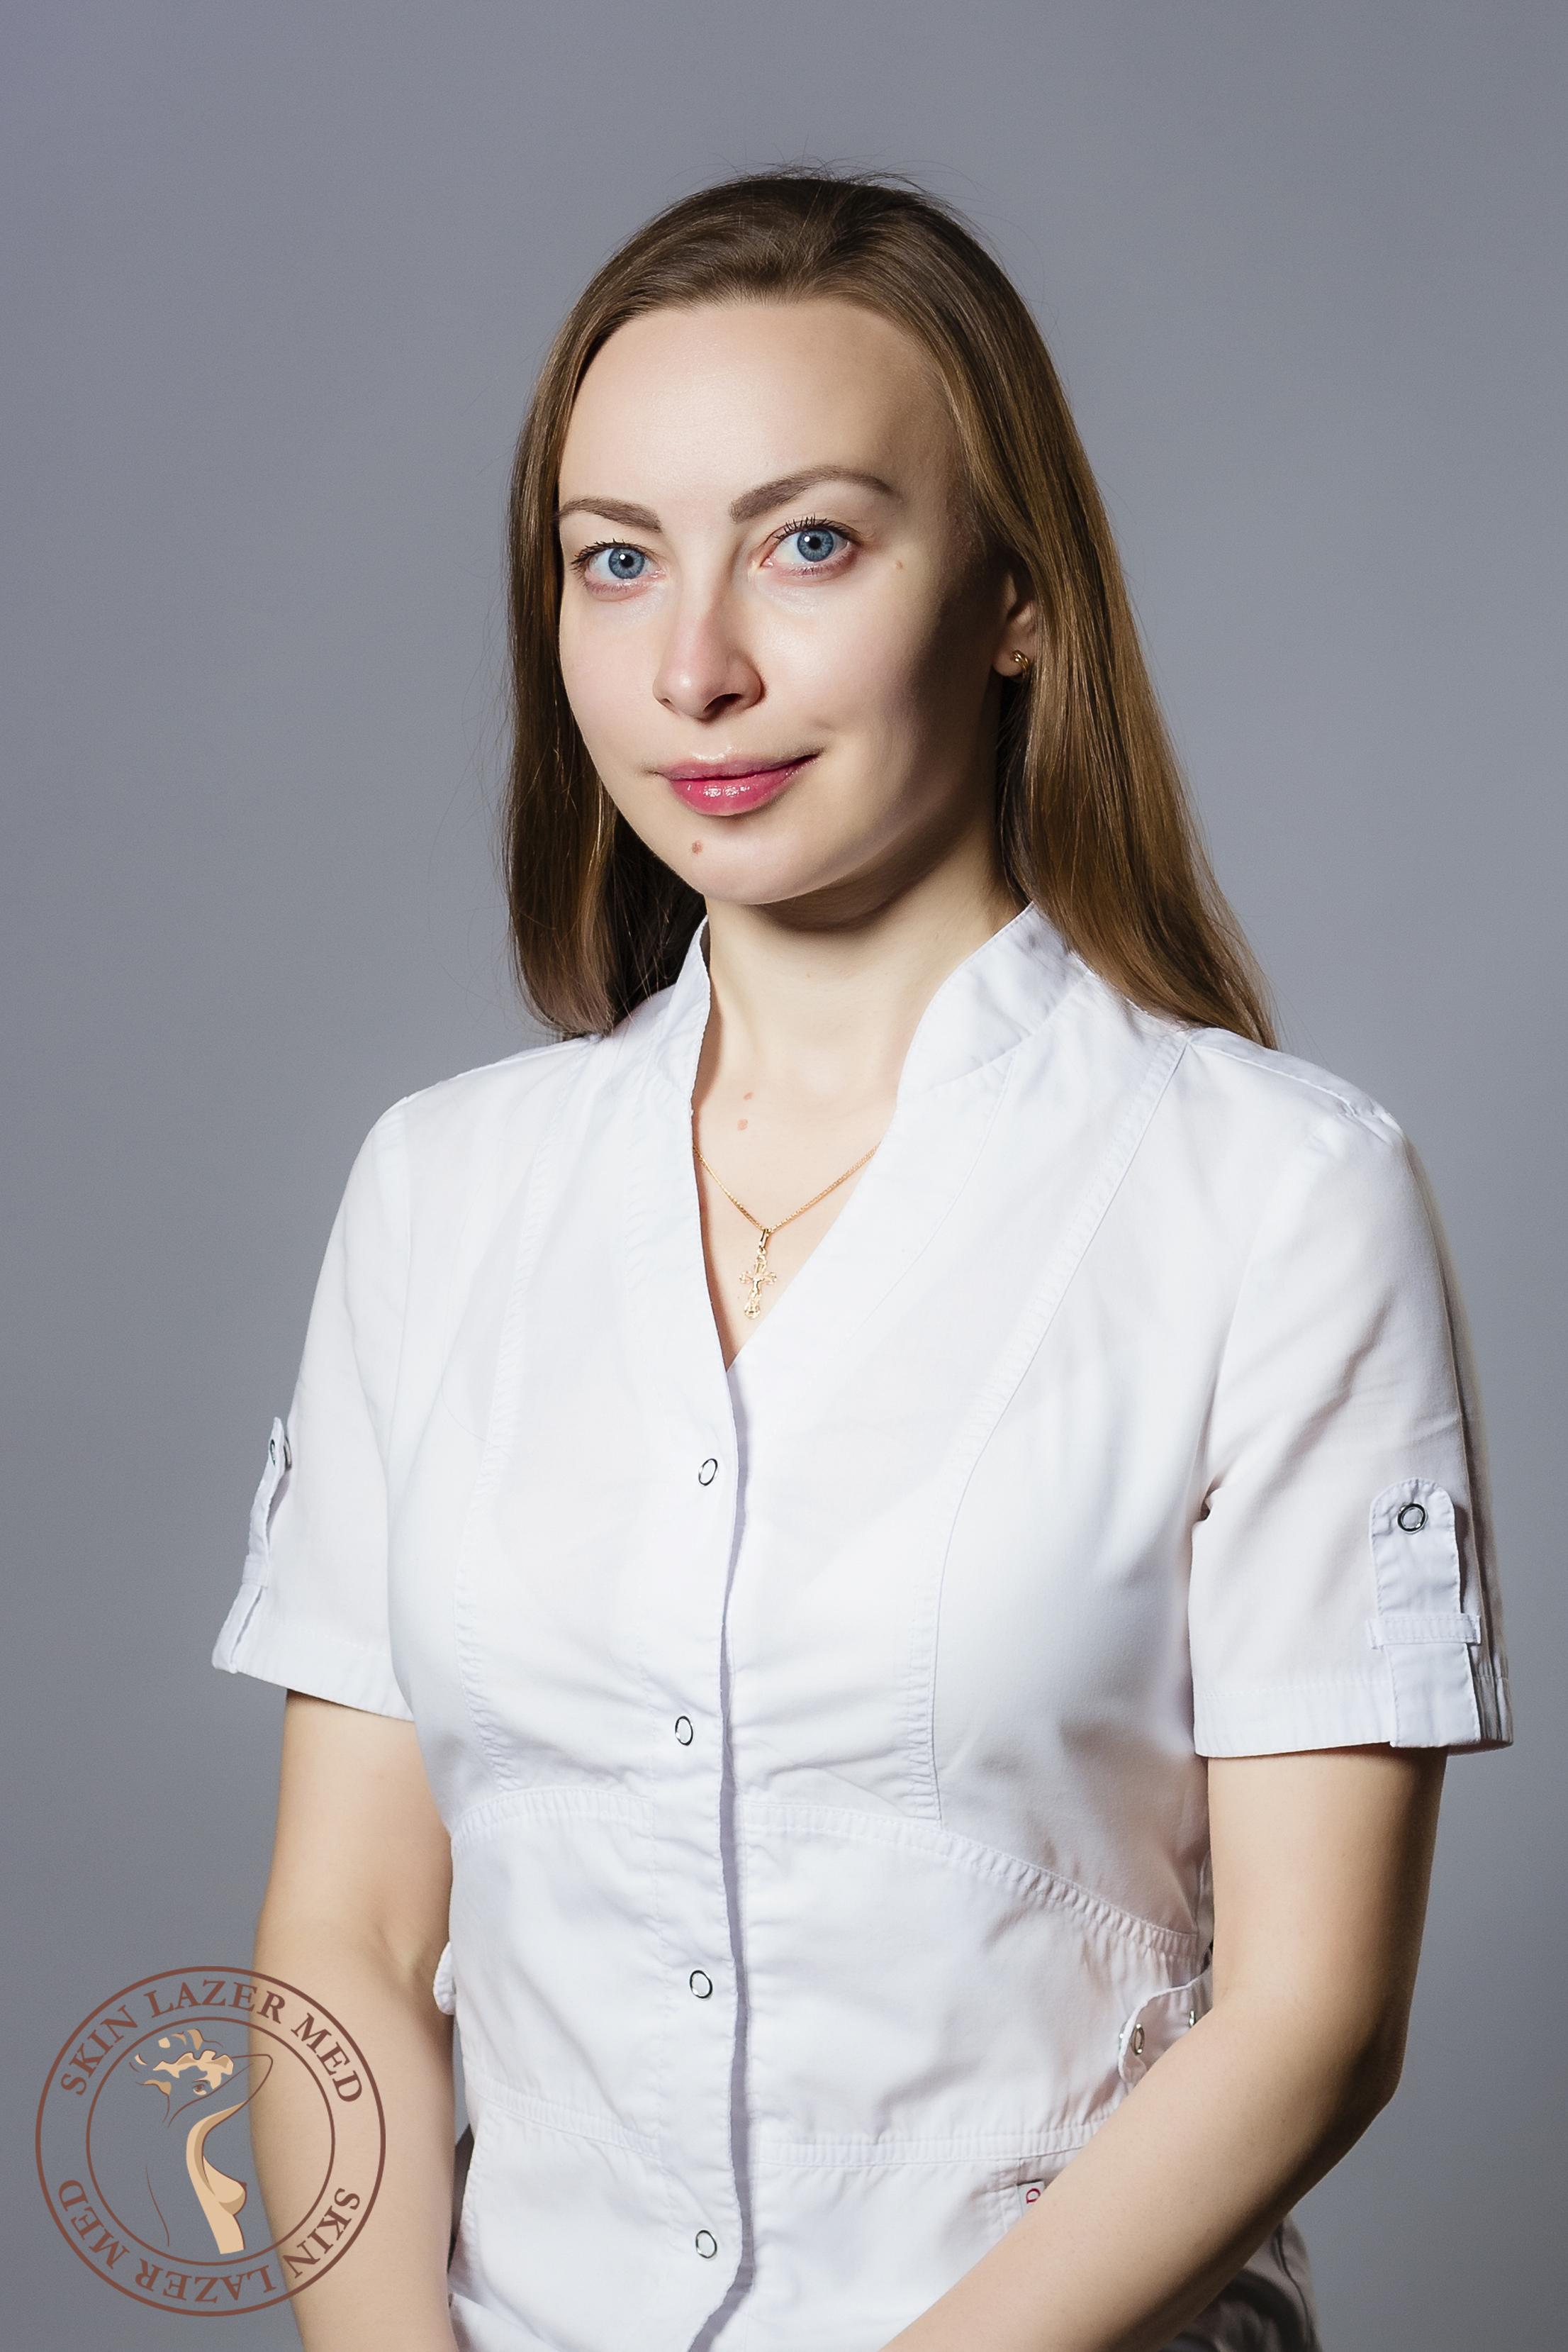 Путина Ирина Сергеевна, врач косметолог, дерматолог